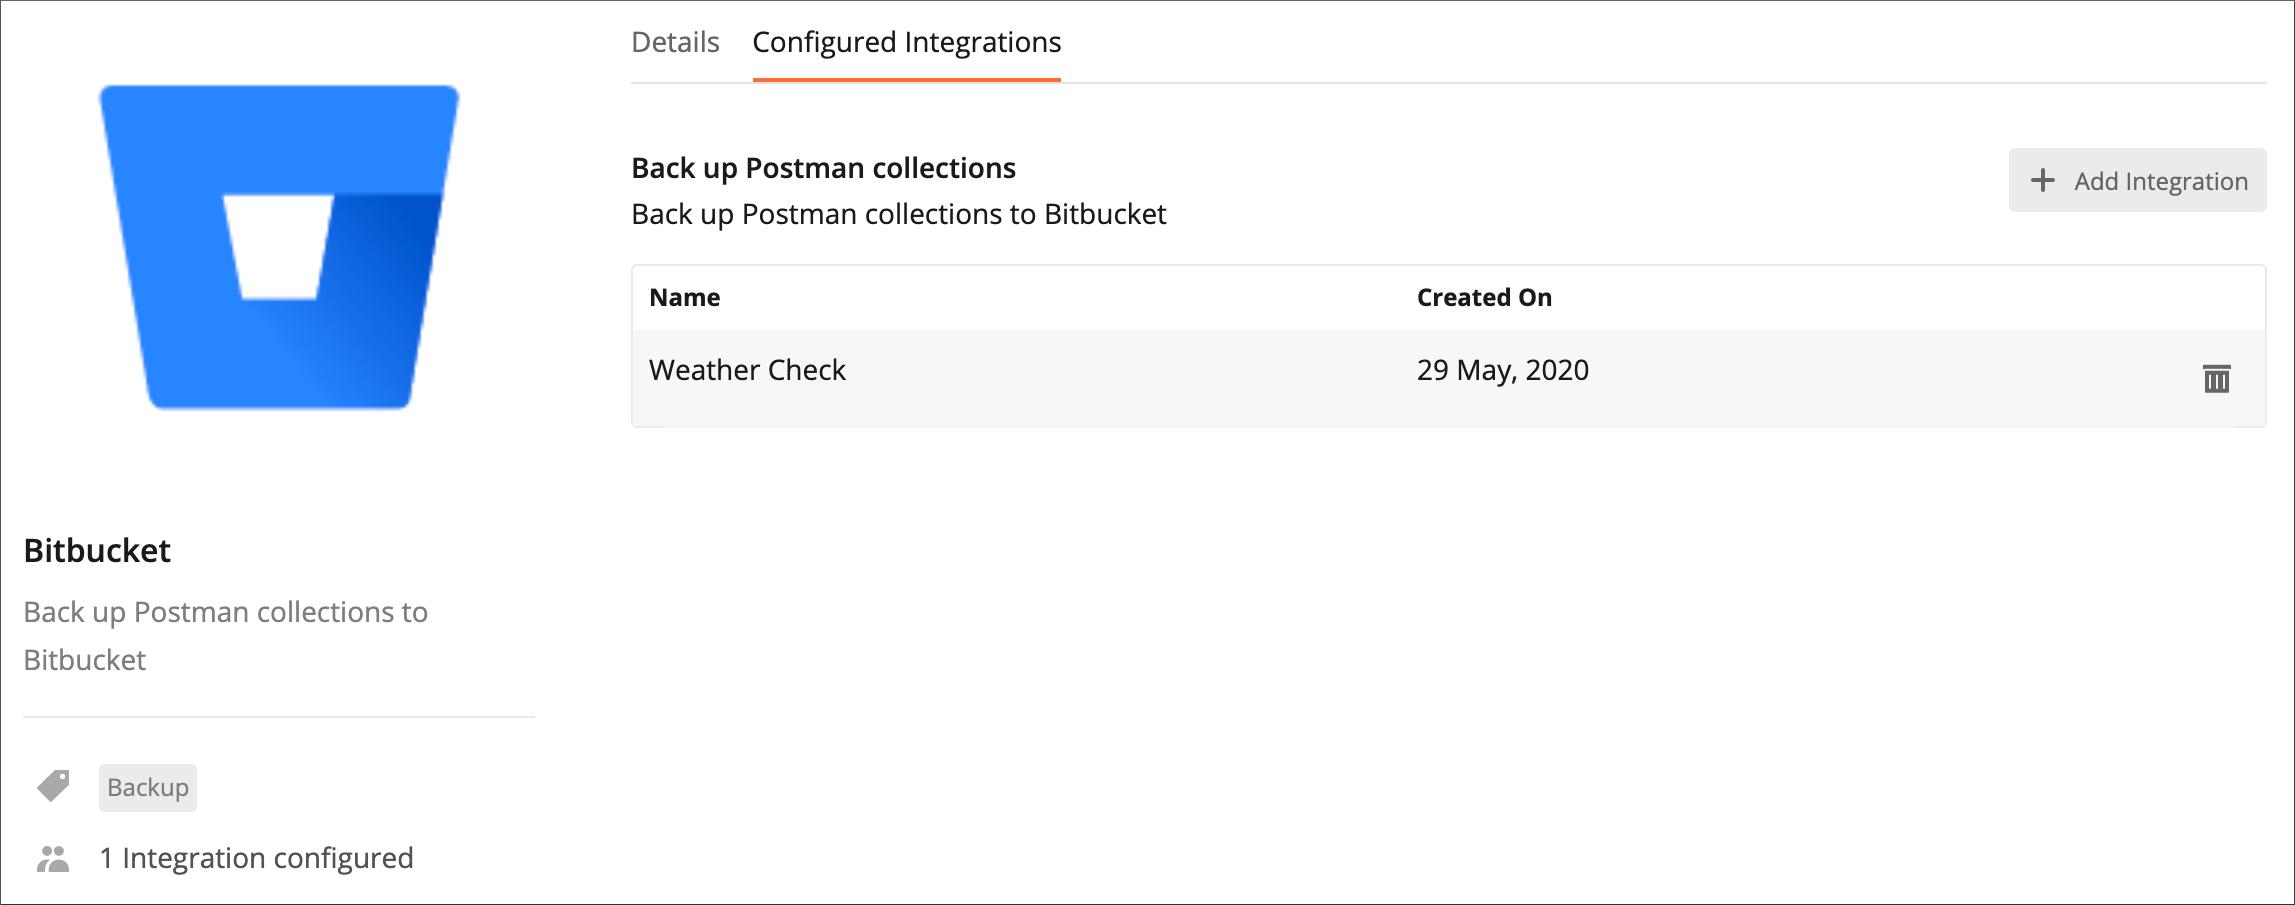 Configured integrations